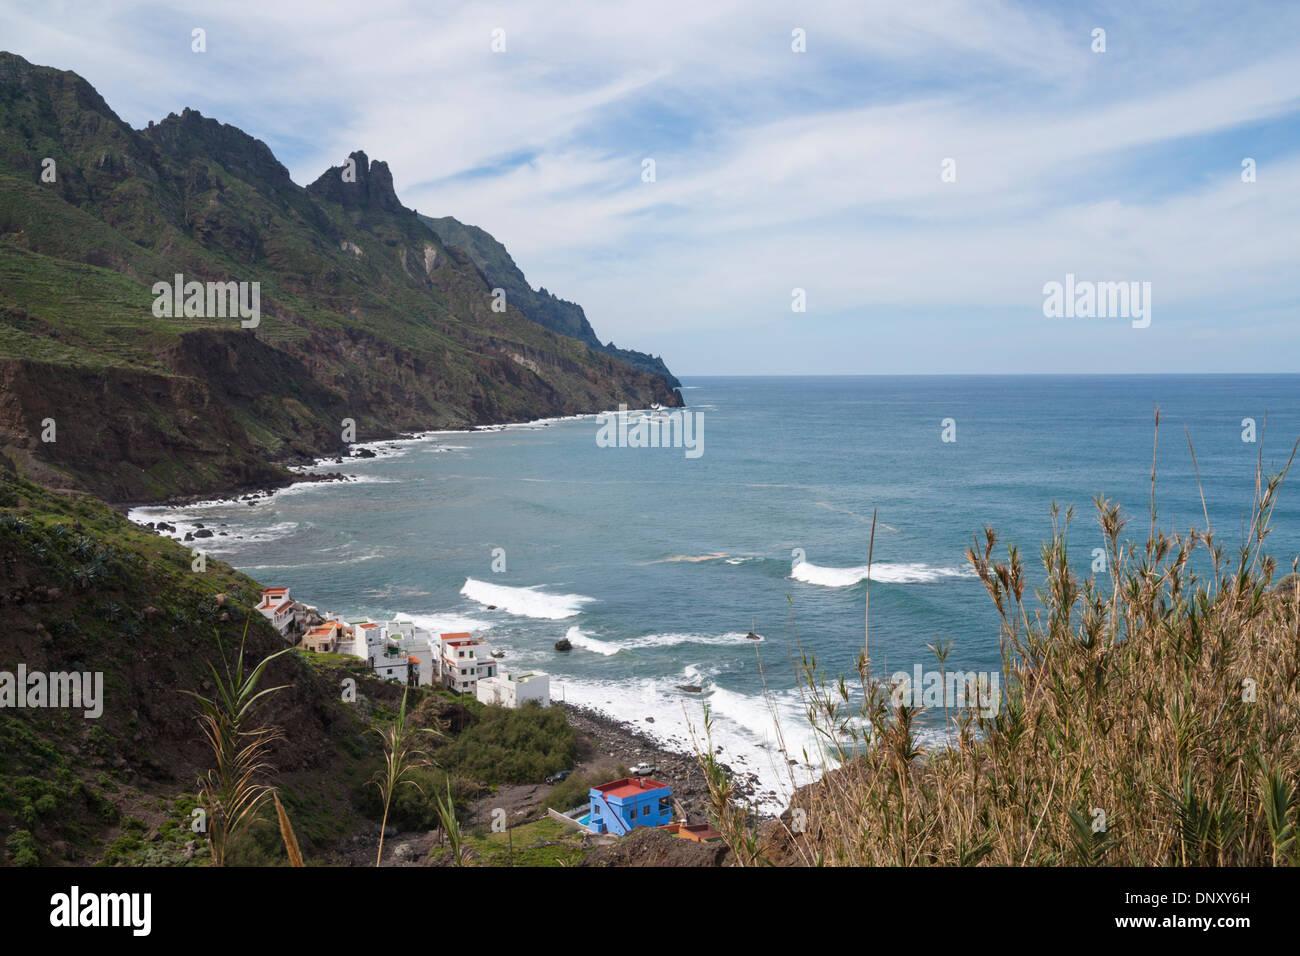 View over bar and houses on Taganana beach. Parque Rural de Anaga, Tenerife Canary Islands, Spain Stock Photo